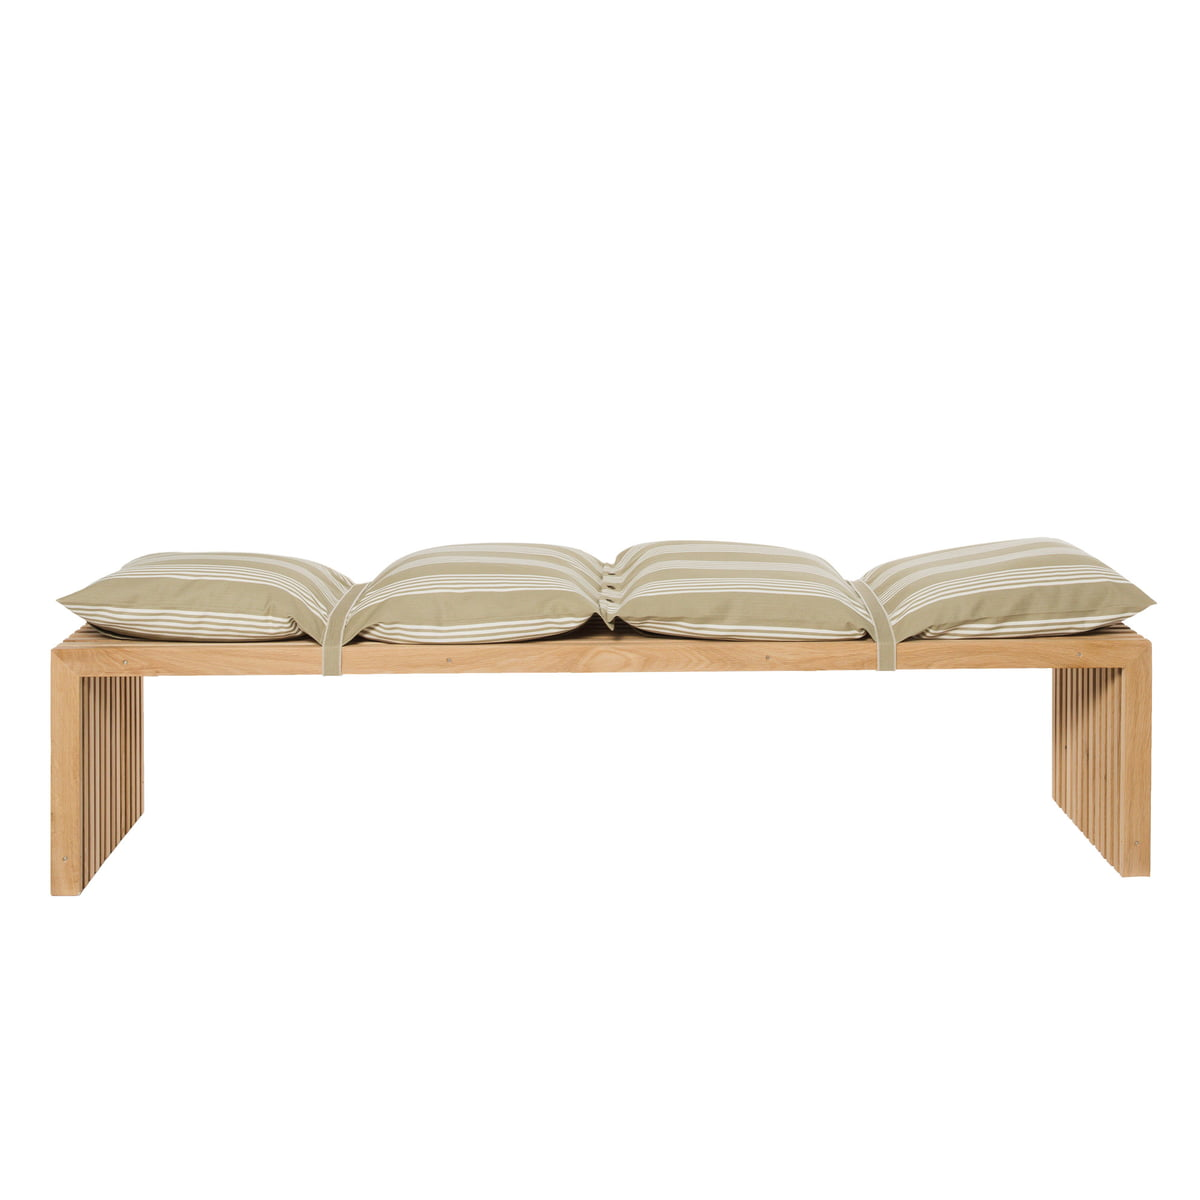 Awe Inspiring Raumgestalt Bench Made Of Oak Lamellas L 60 Cm Natural Oak Gamerscity Chair Design For Home Gamerscityorg